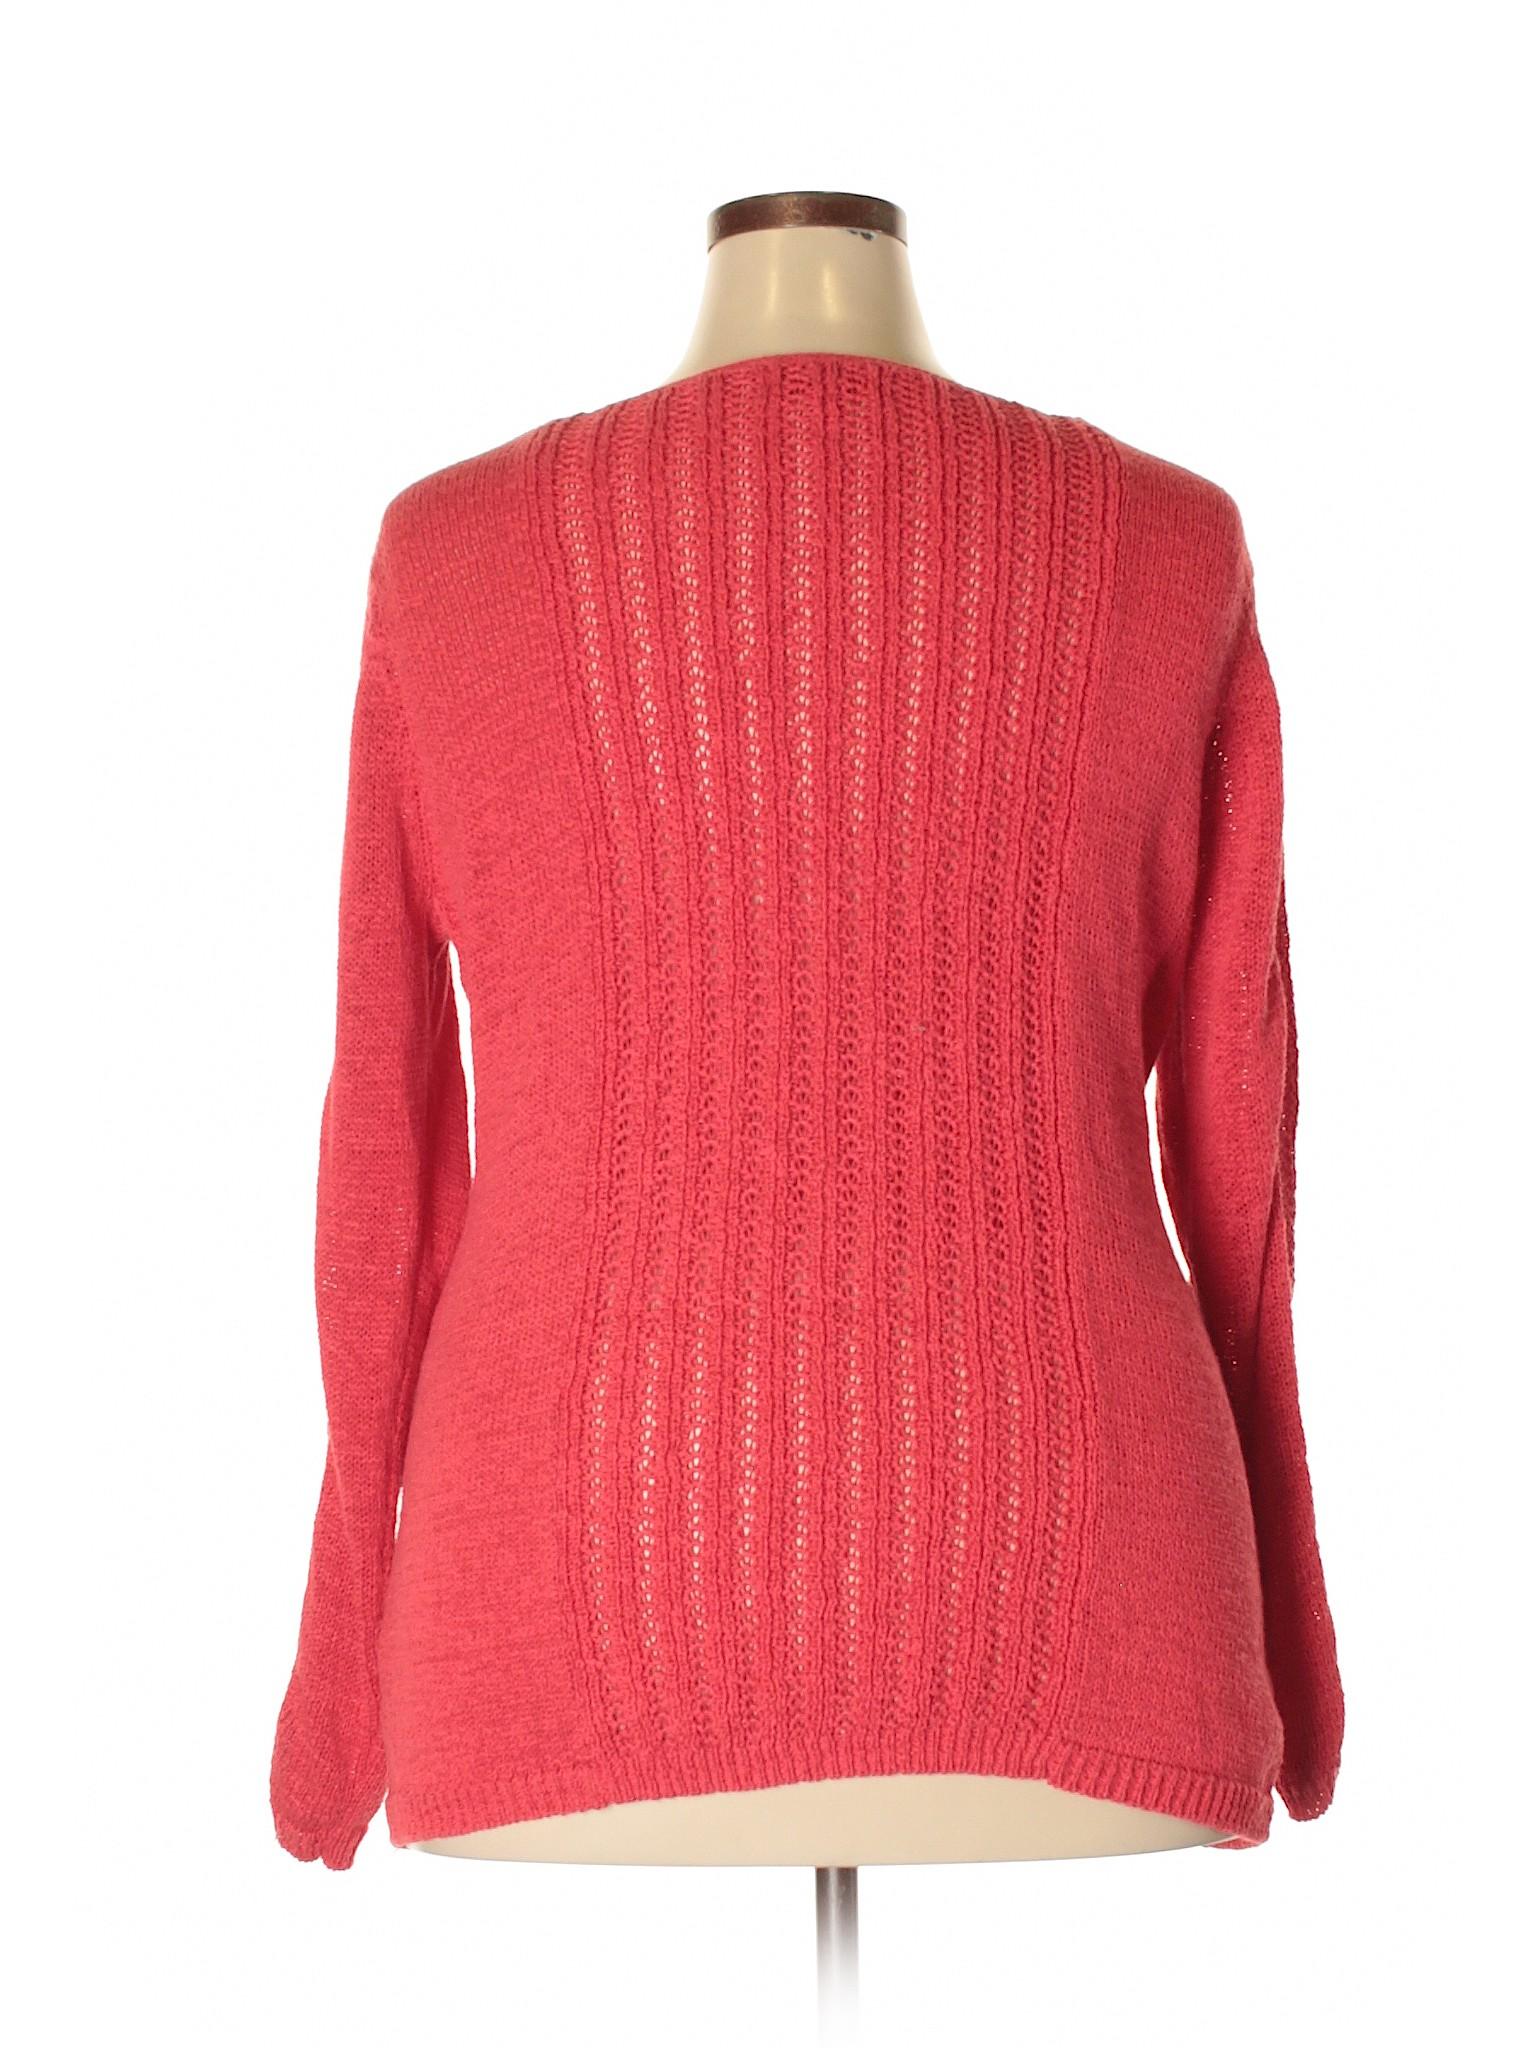 Sweater winter Rachel Boutique Zoe Pullover qz1TY7w